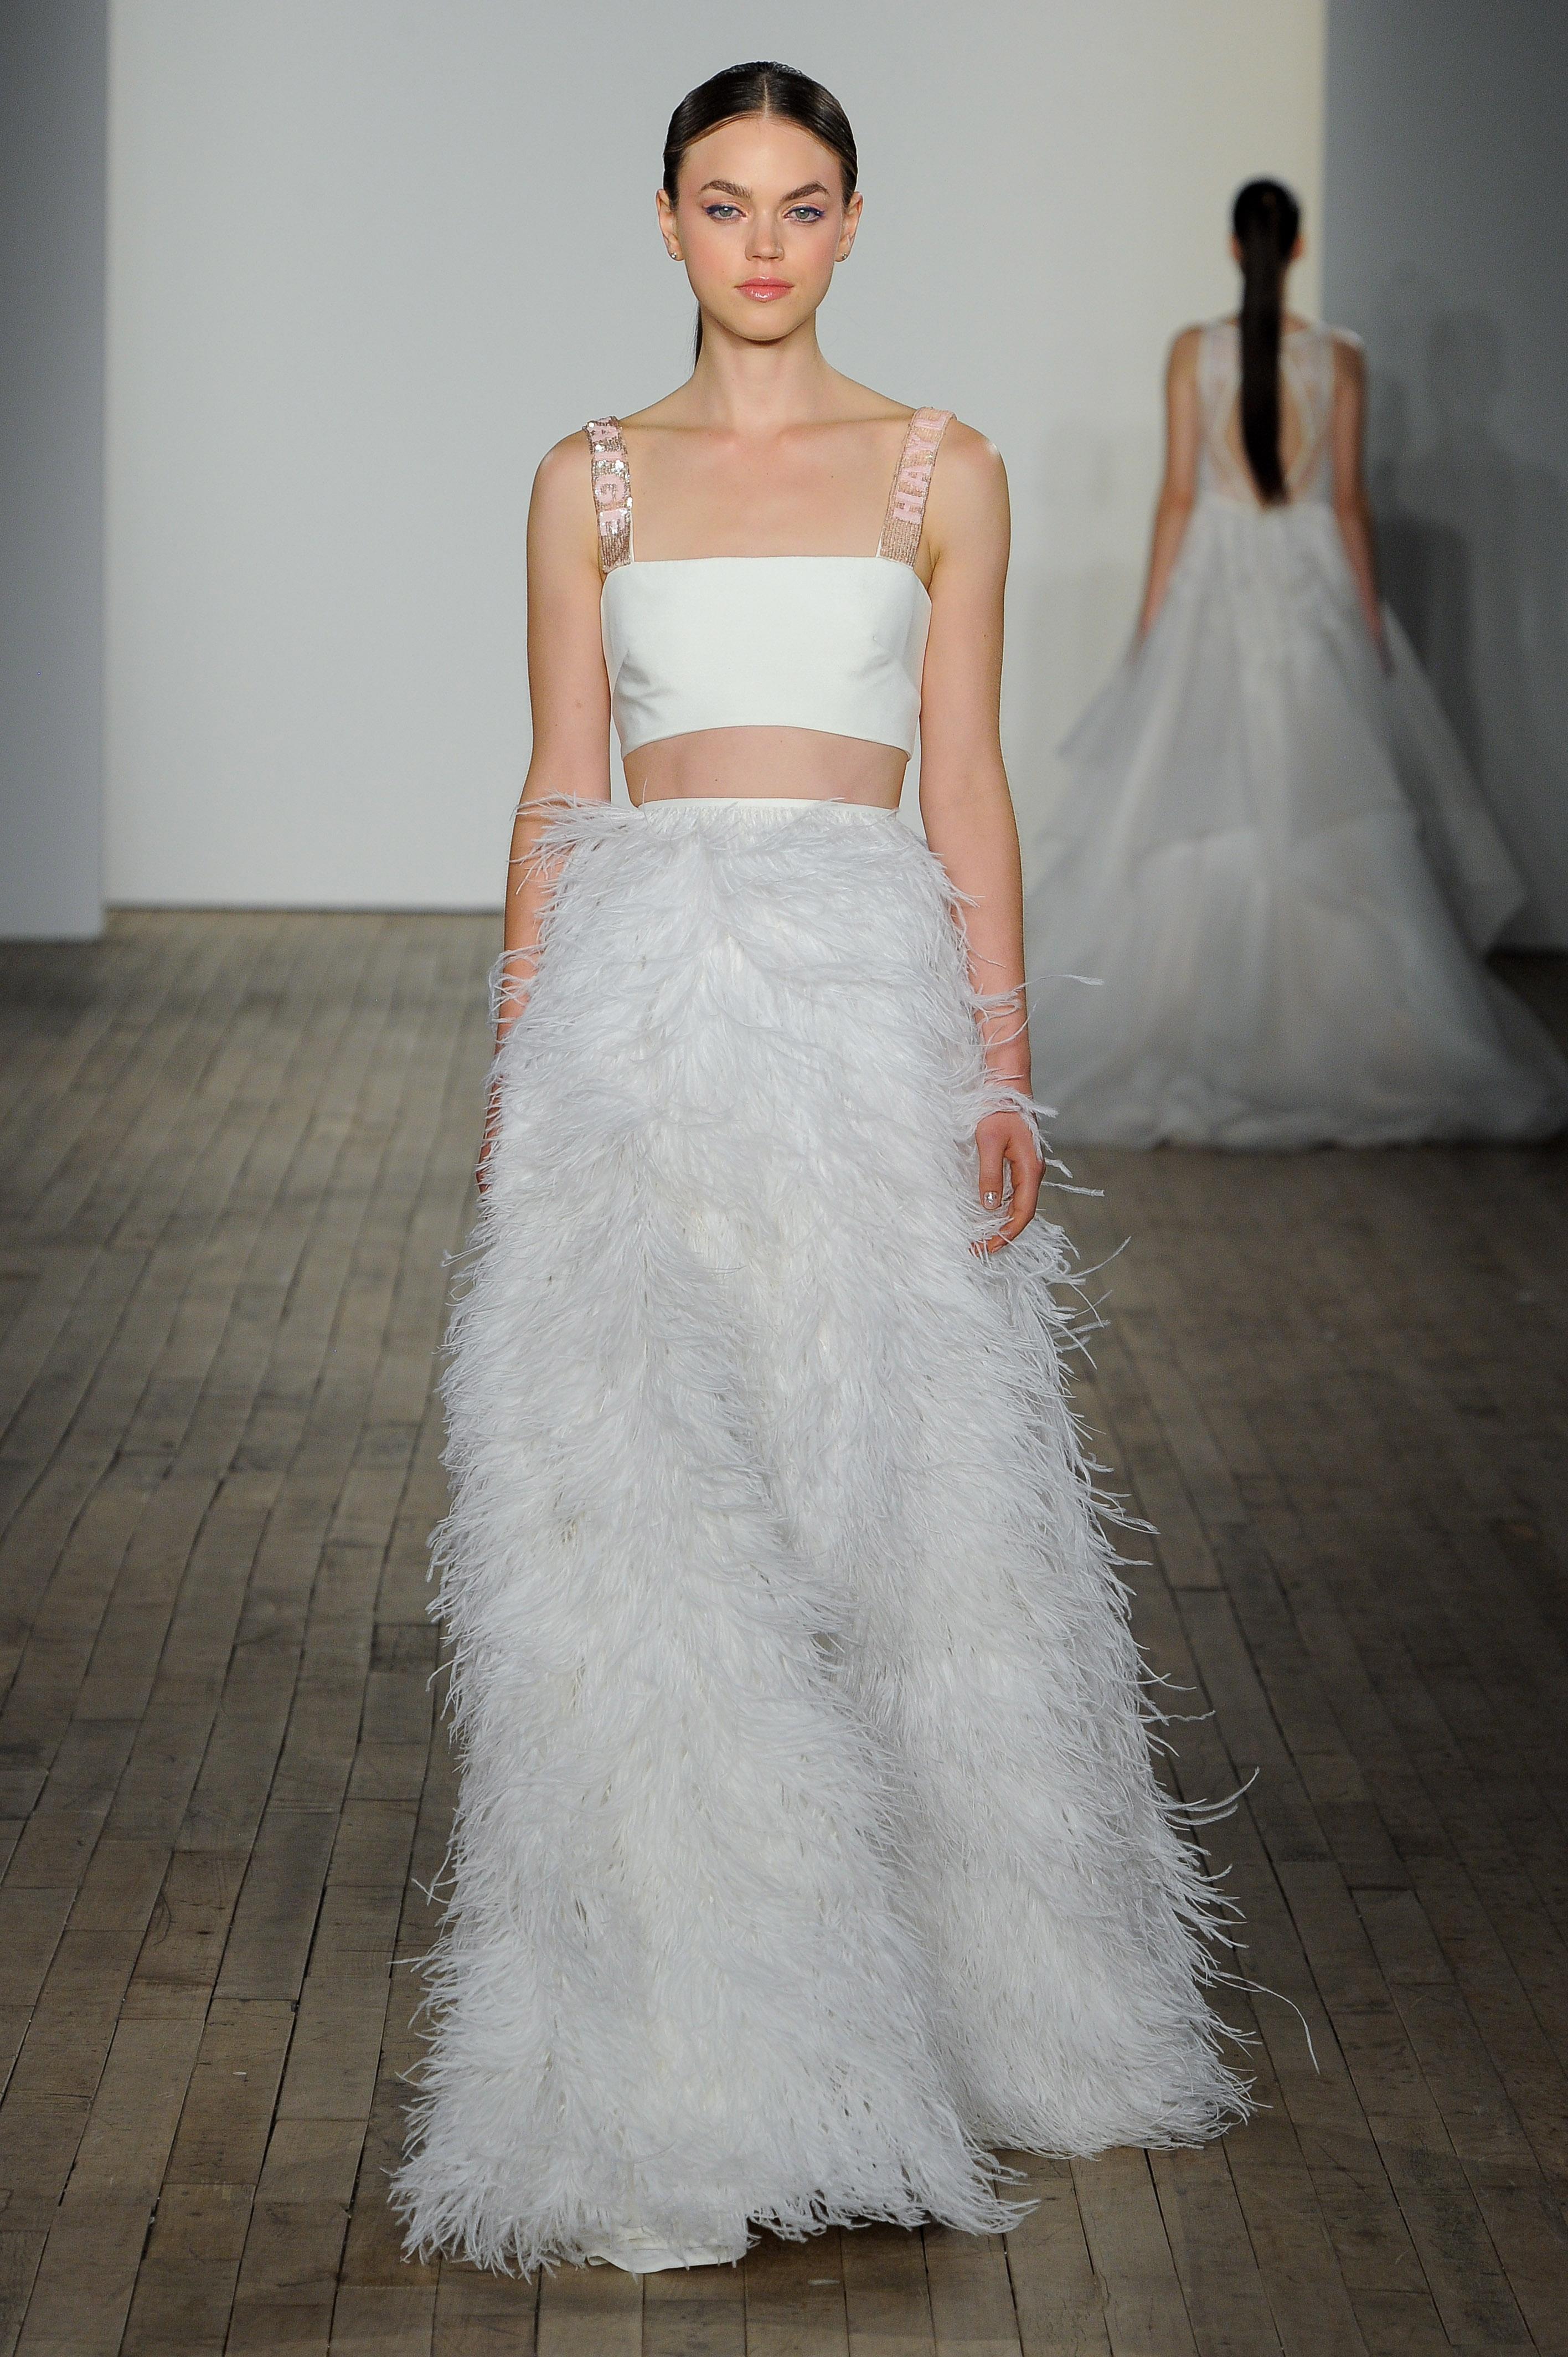 haley paige fall 2019 fringe pants wedding dress